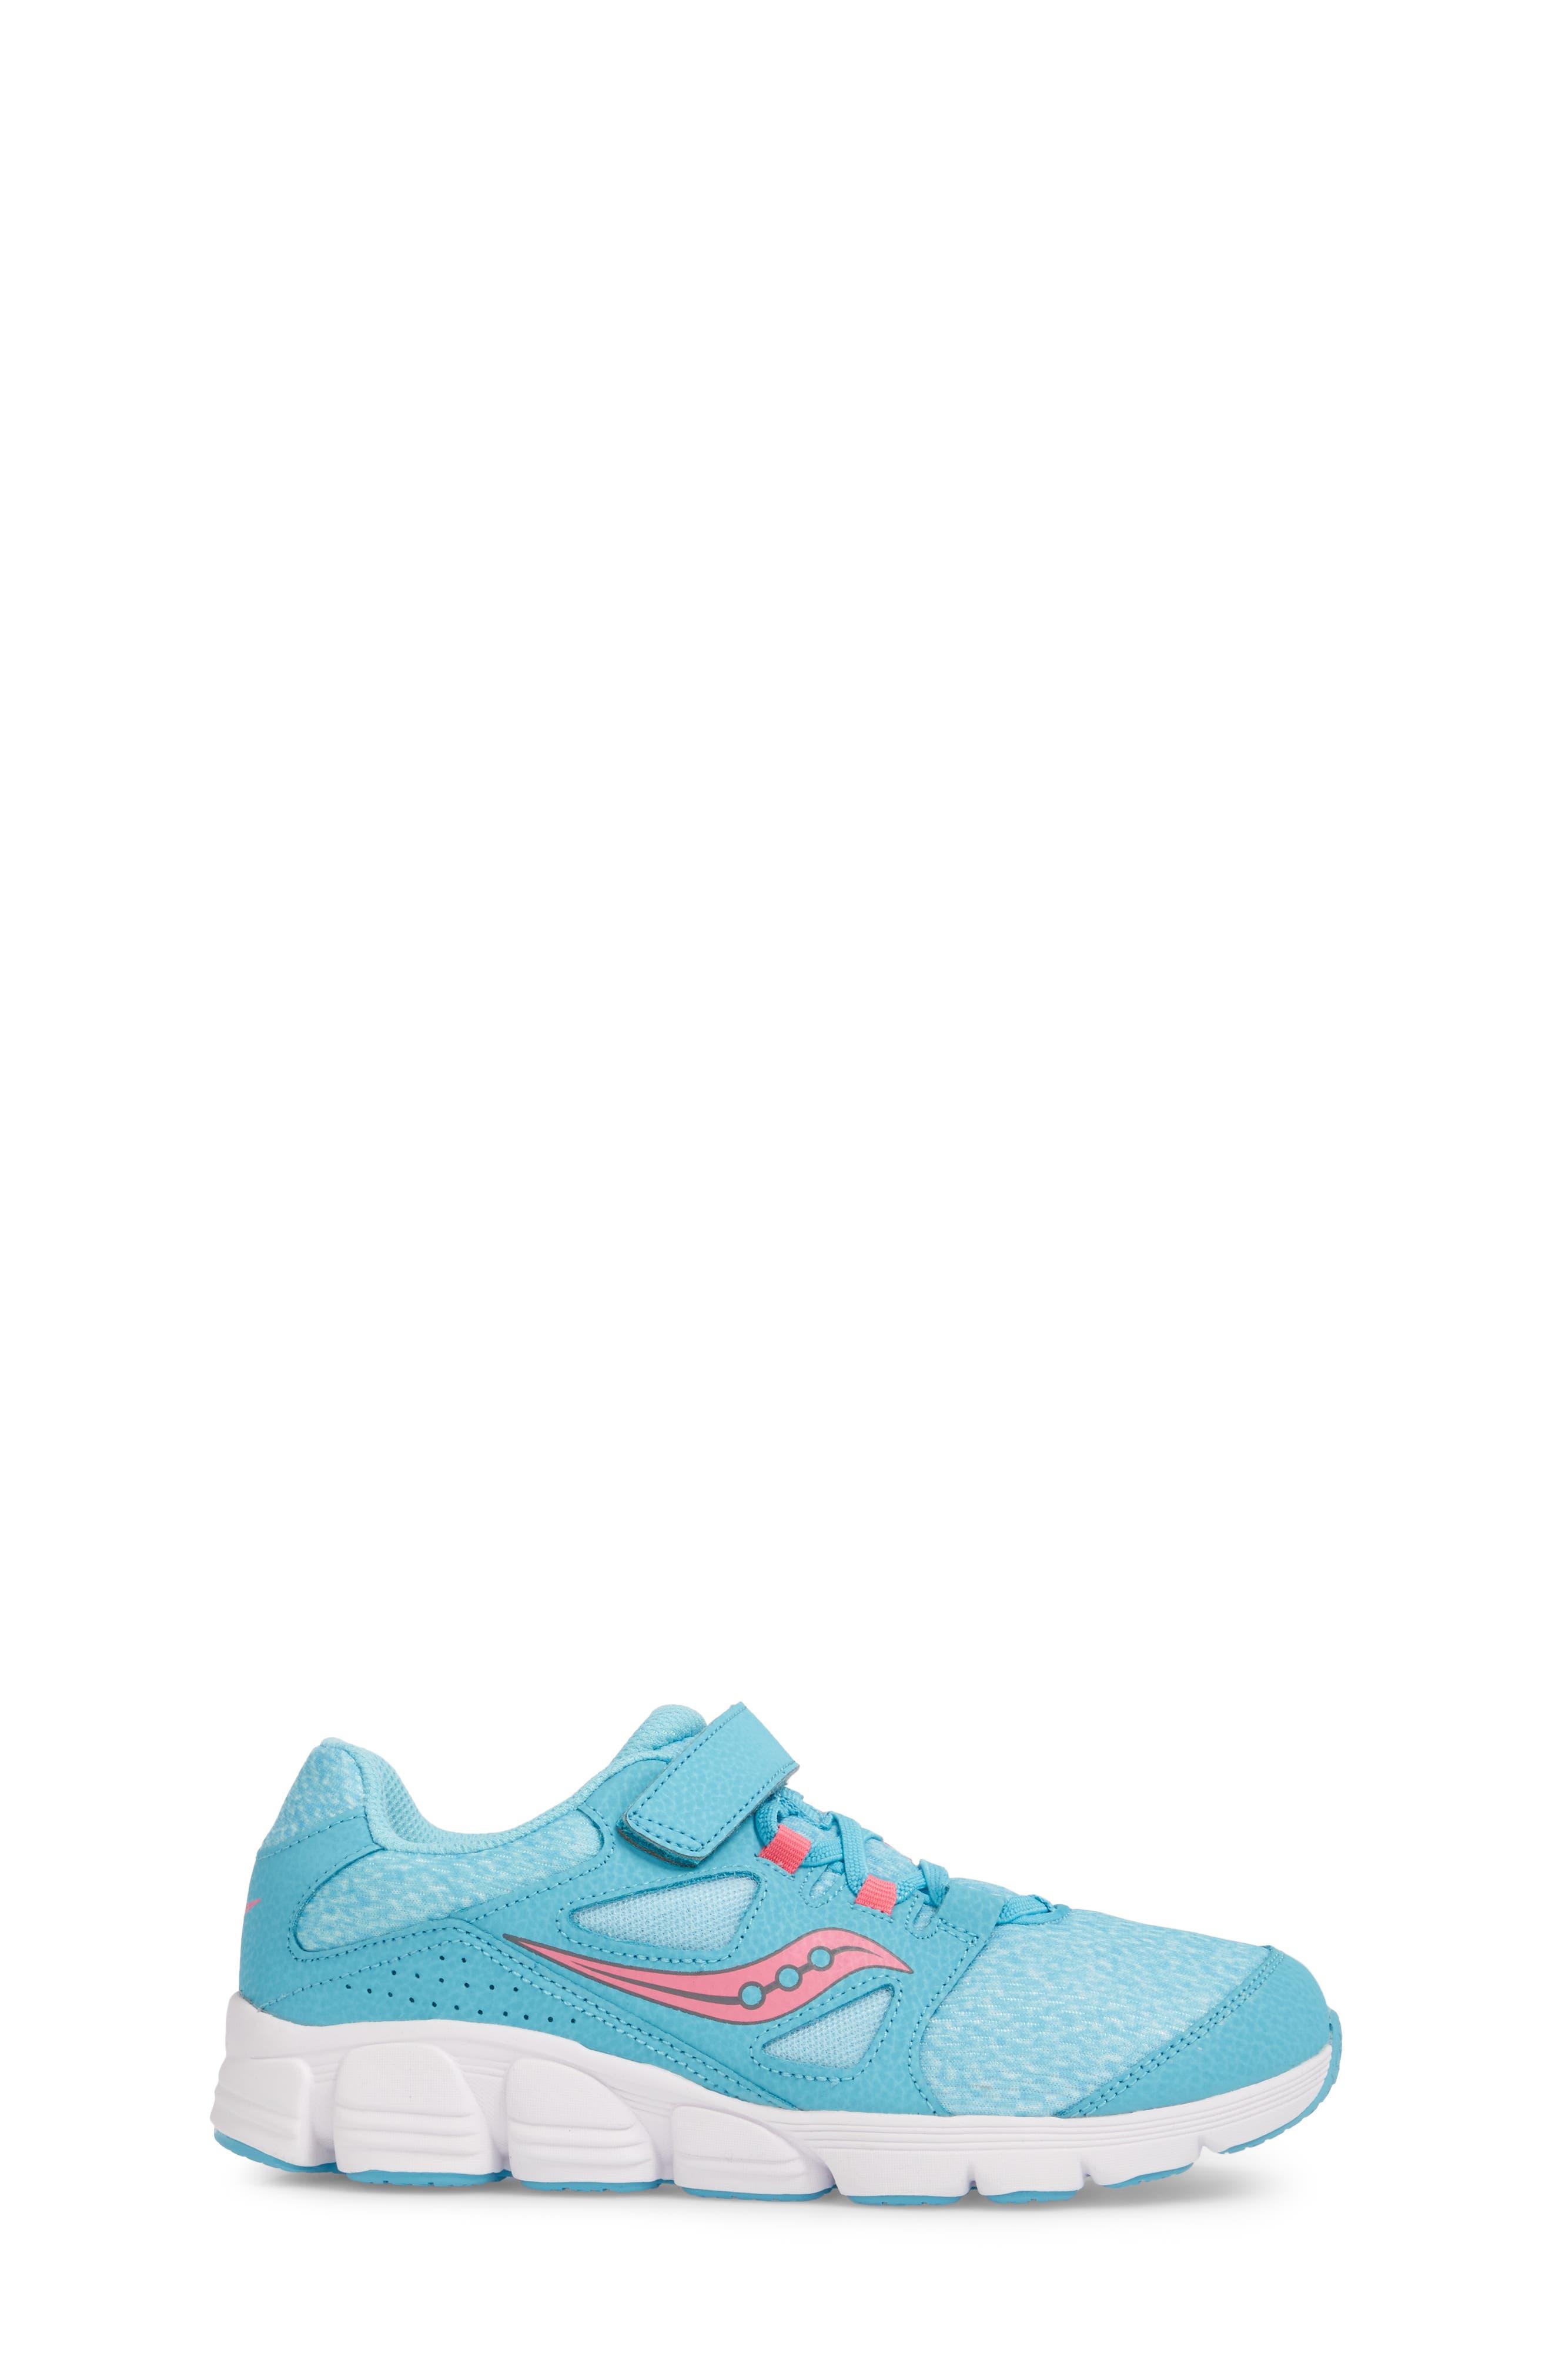 Kotaro 4 Sneaker,                             Alternate thumbnail 3, color,                             TURQUOISE/ PINK